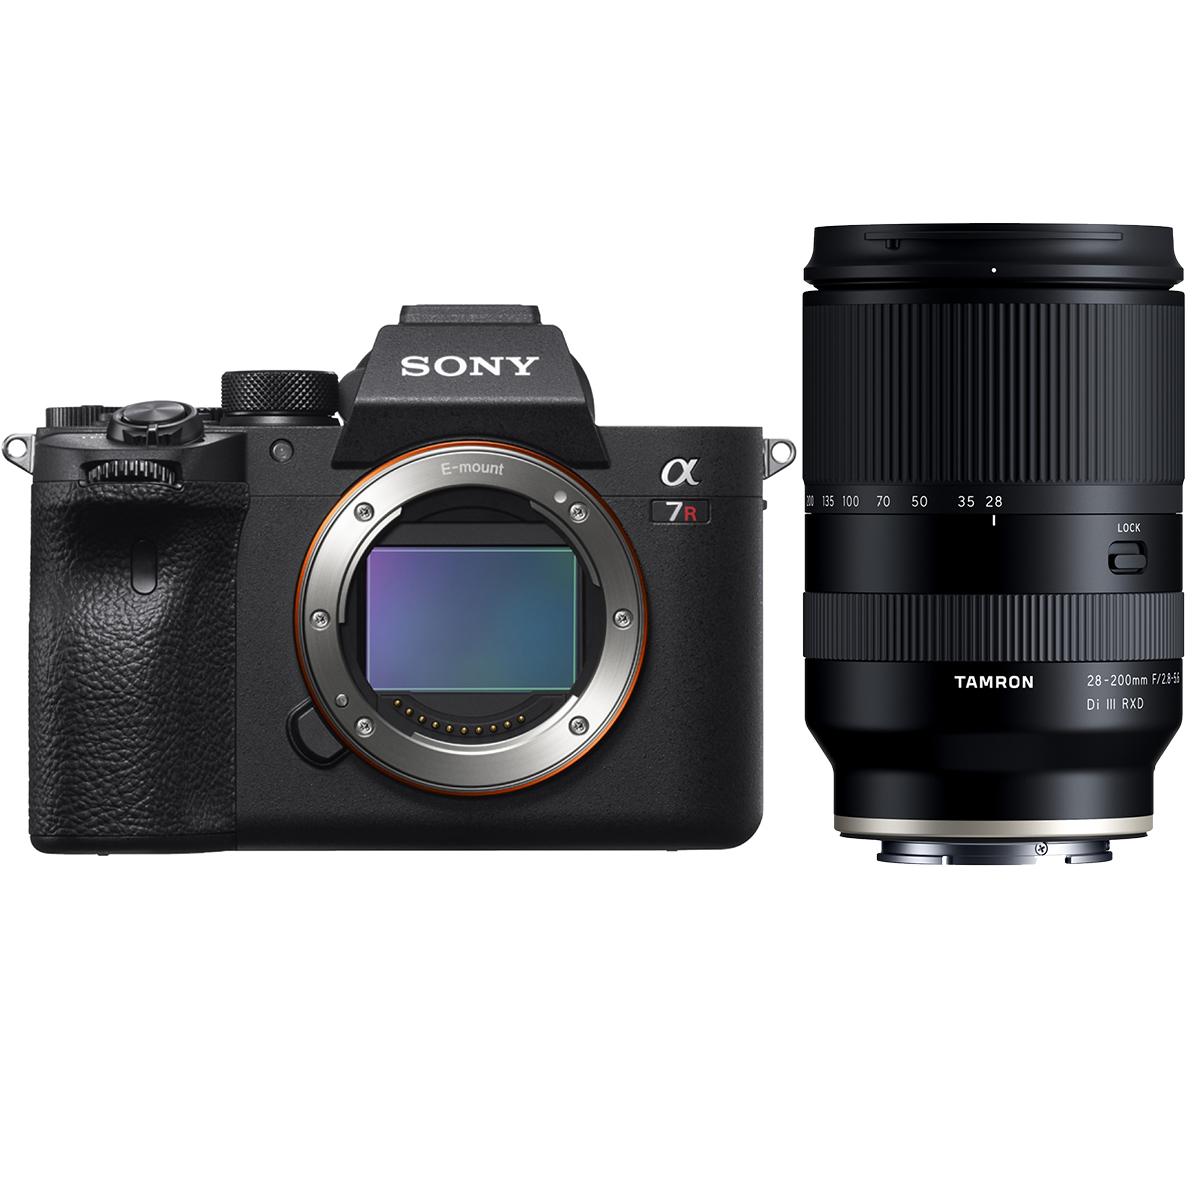 Sony Alpha 7R IV + Tamron 28-200mm 1:2,8-5,6 Di III RXD